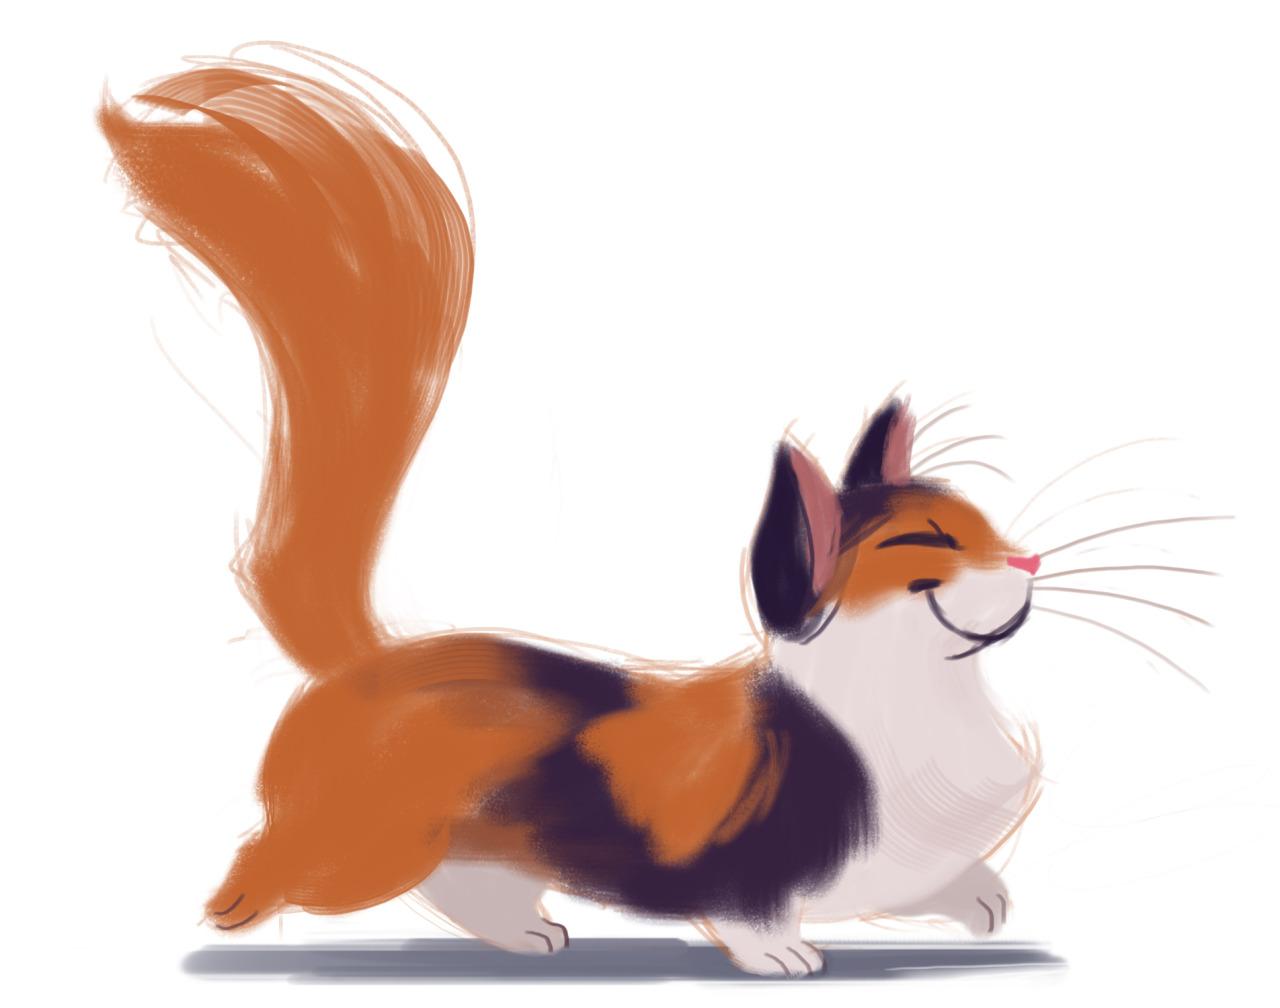 Cat Illustration Tumblr Daily Cat Drawi...